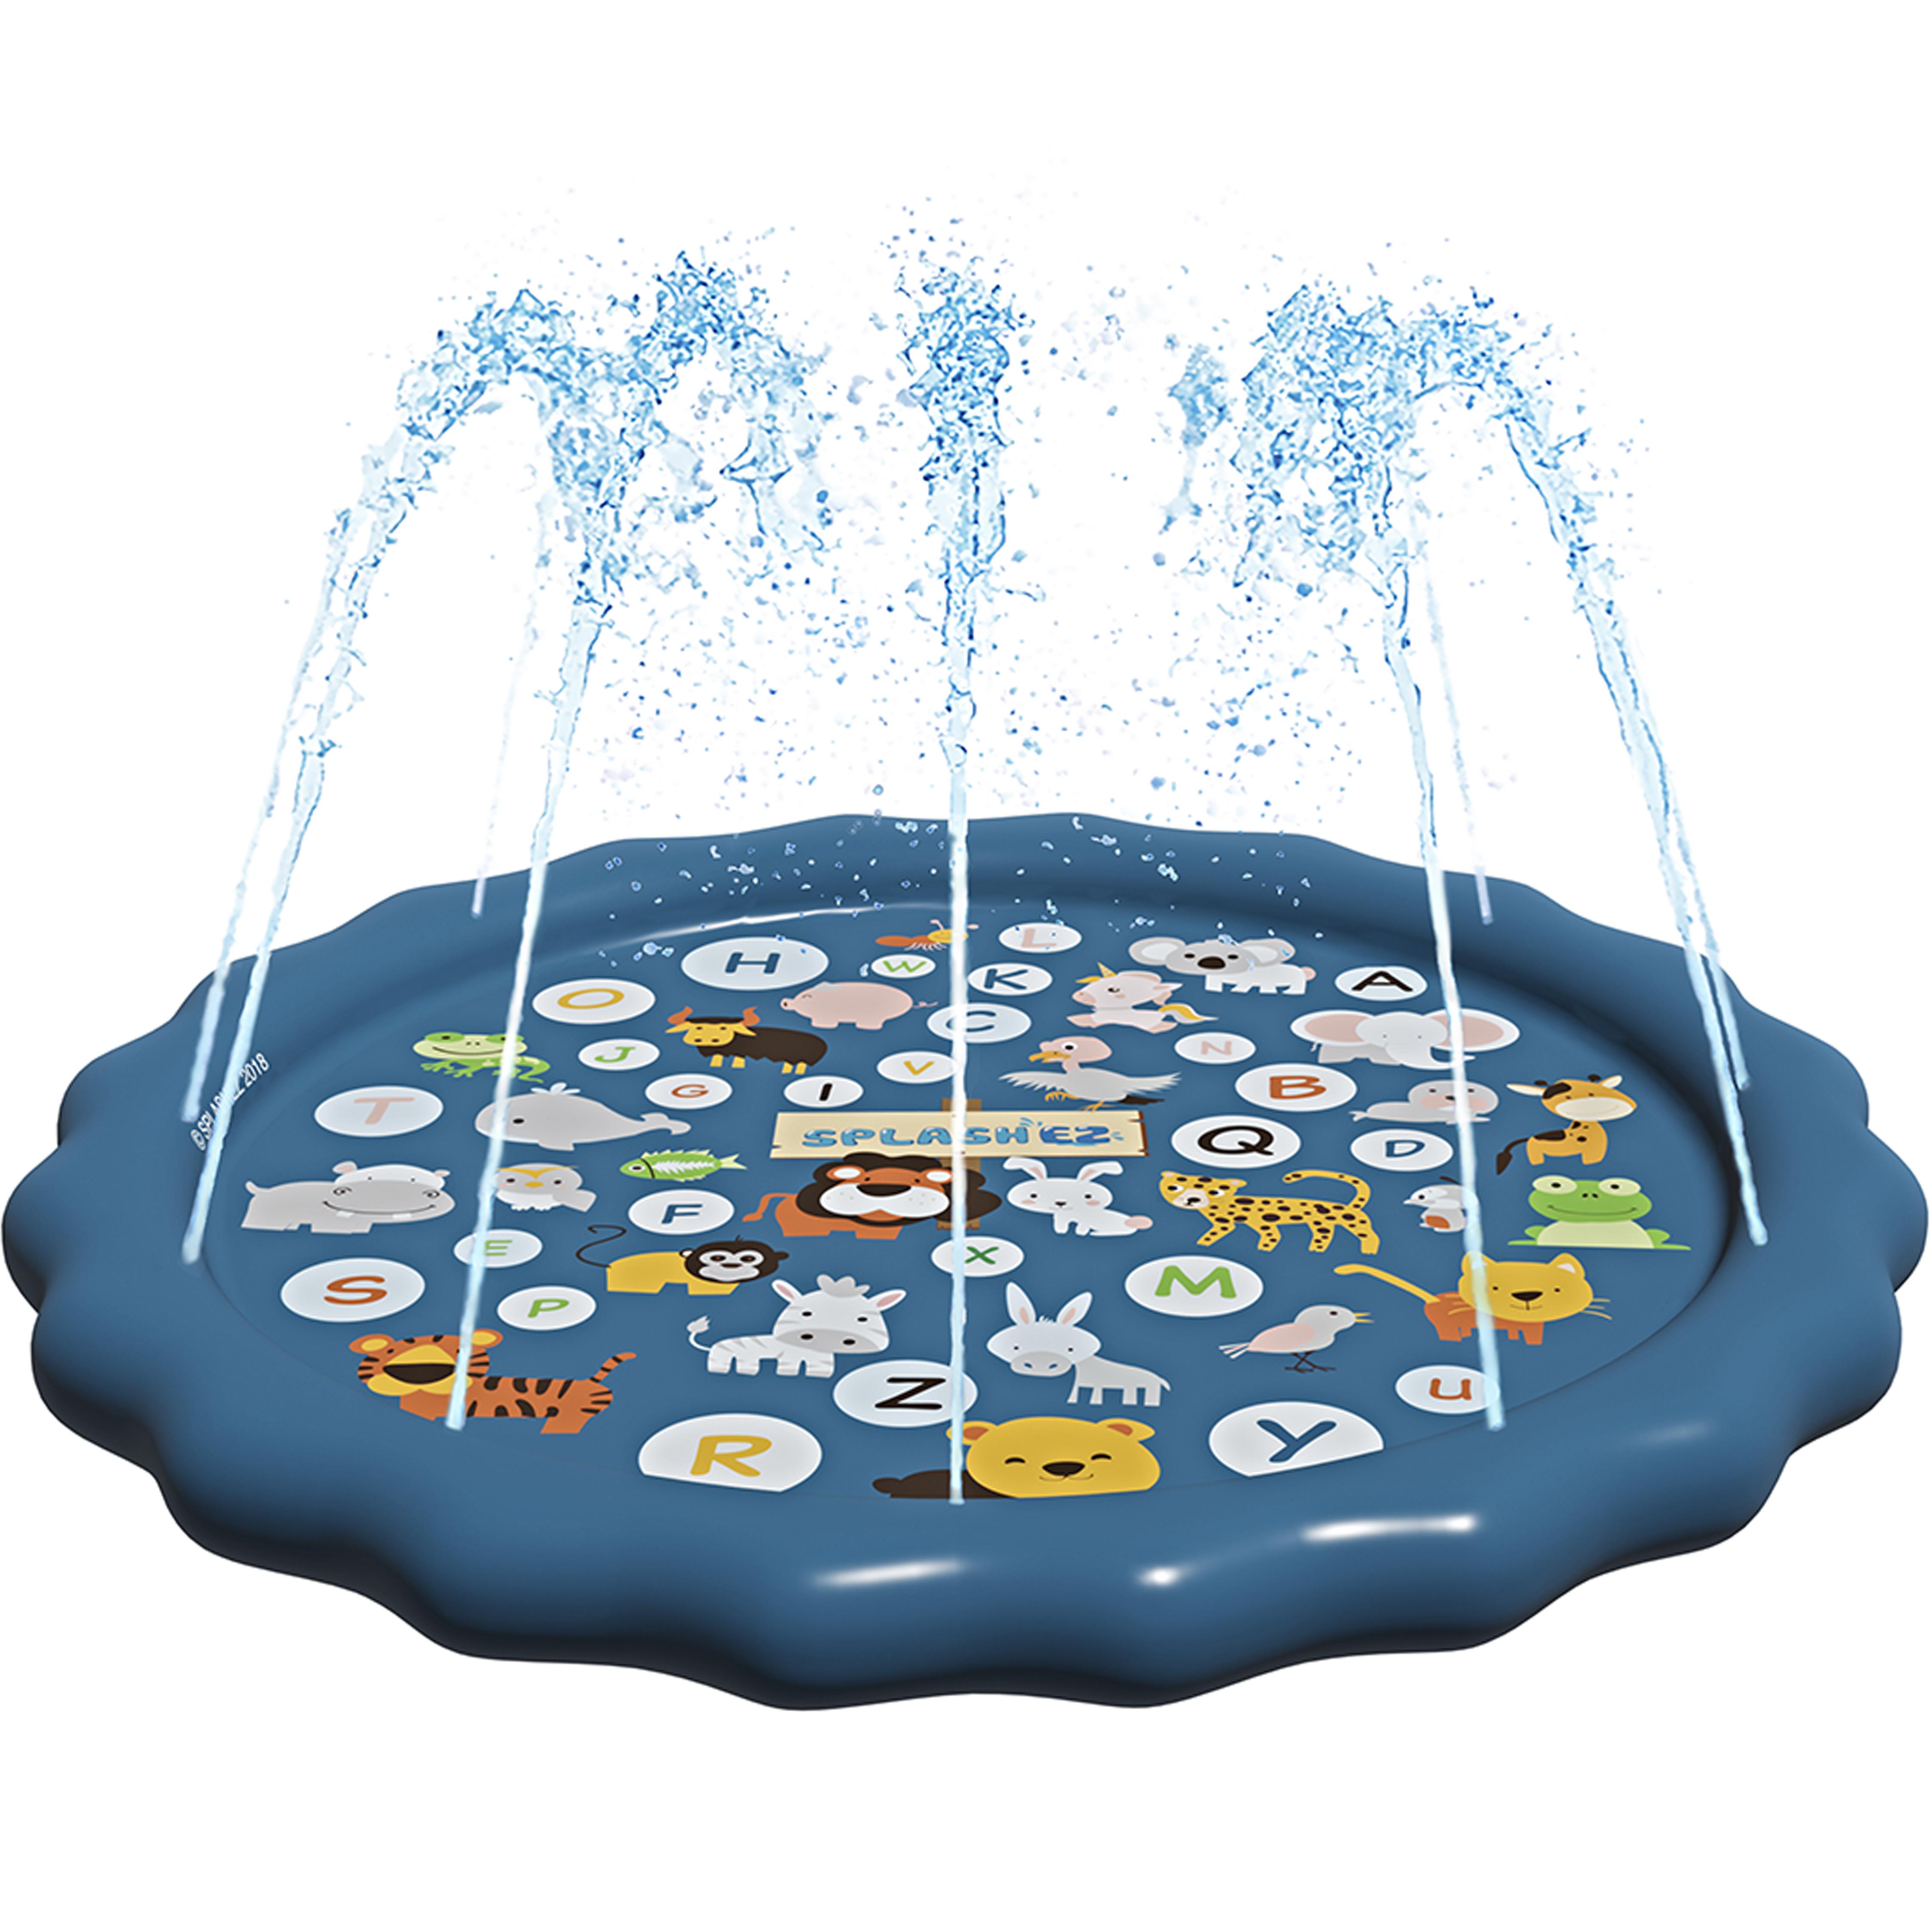 SplashEZ Educational Sprinkler Pool